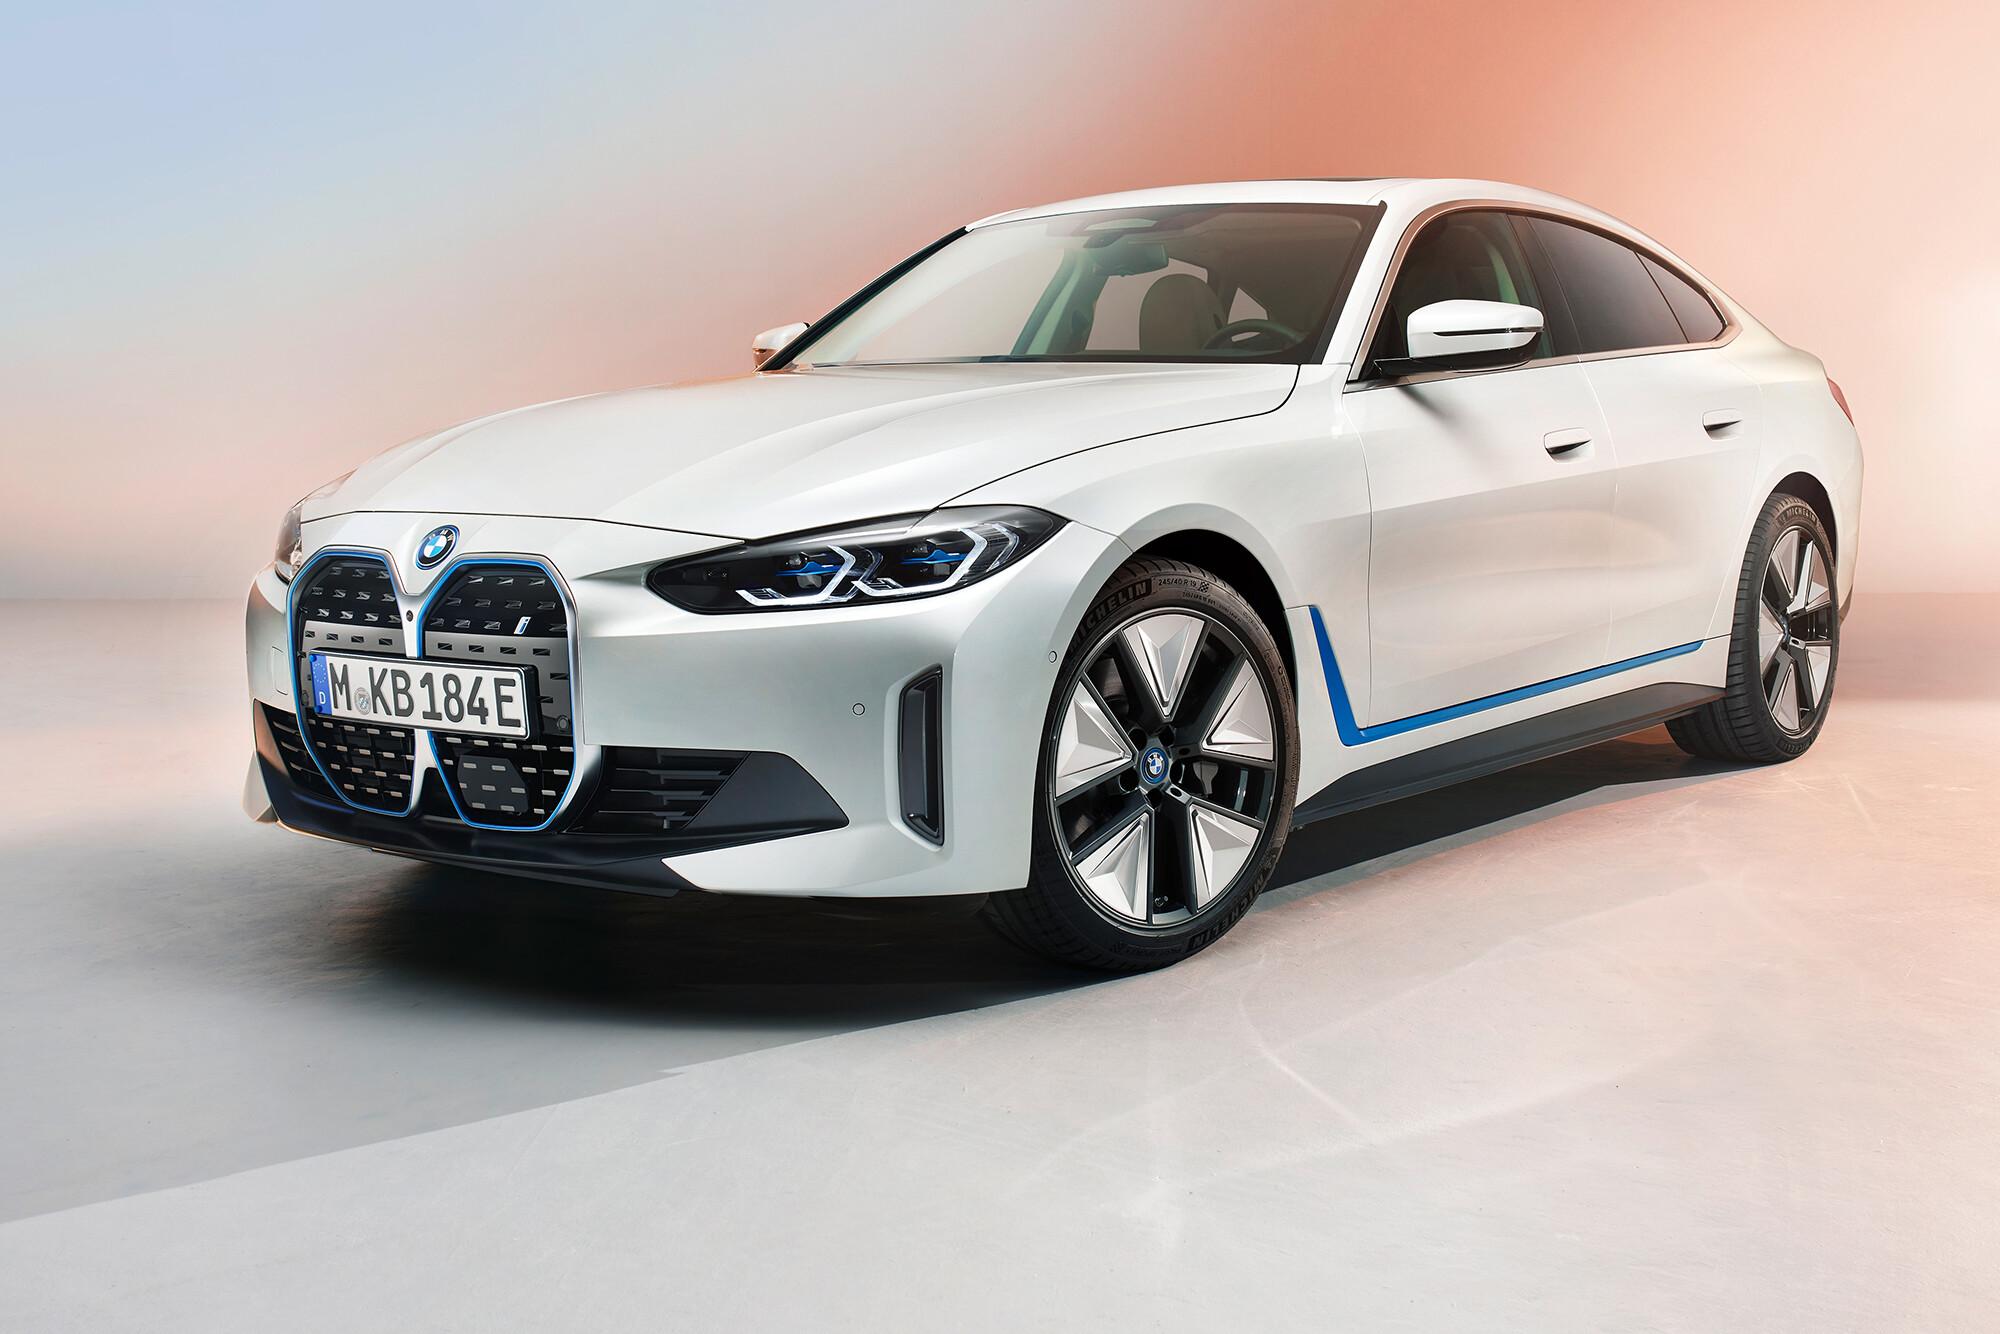 2022 Bmw I 4 Electric Car Revealed 1 Jpg